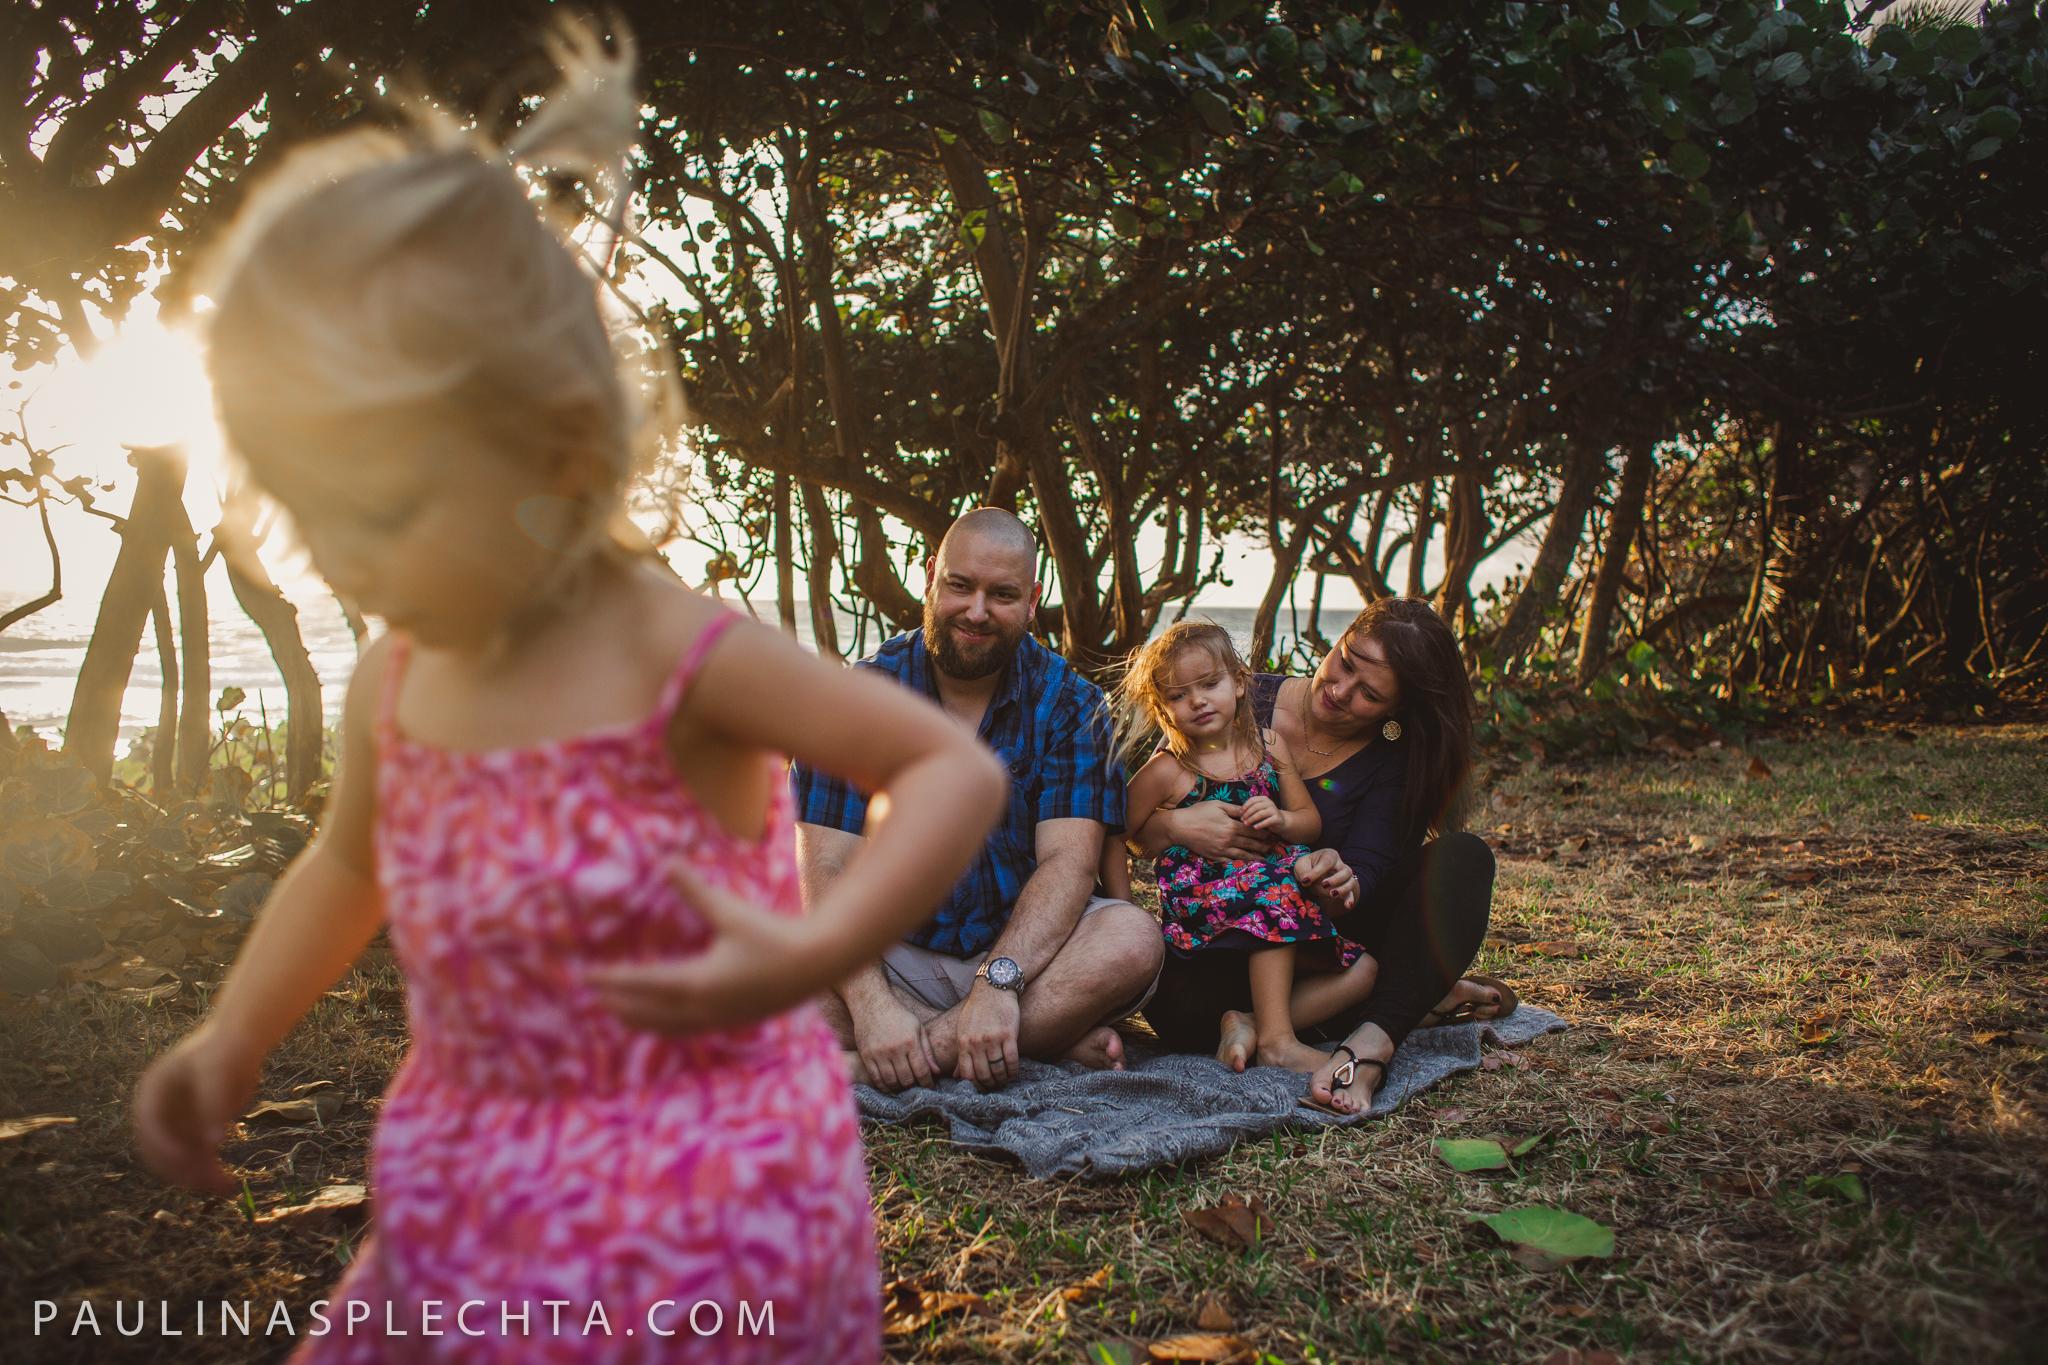 Family Photographer South Florida Pompano Broward Palm Beach Babies Baby Newborn Breastfeeding Birth Photograpy Beach Home Documentary Session-90.jpg